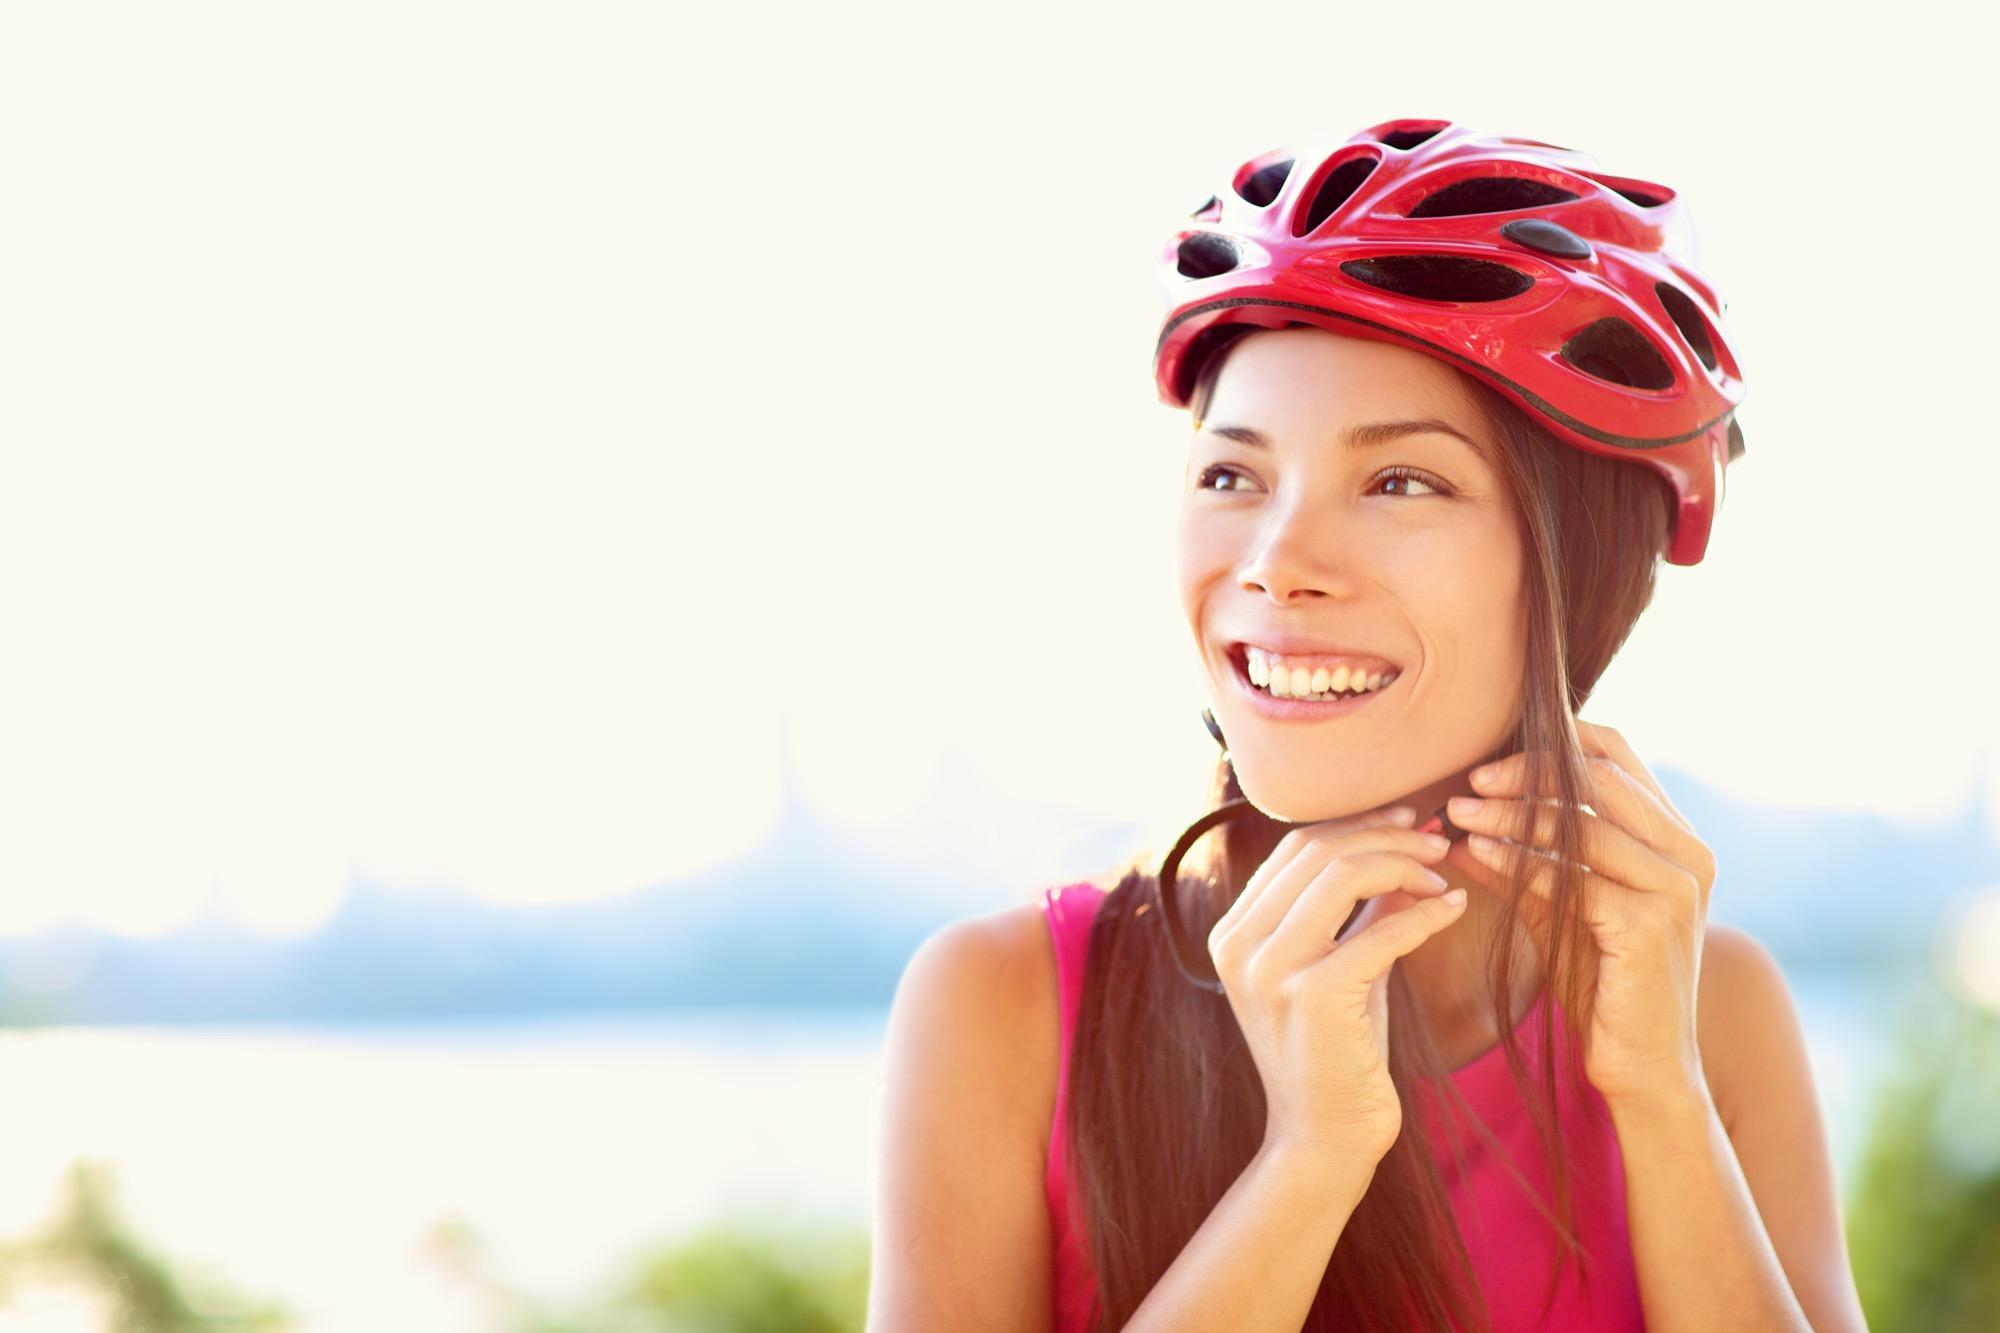 Fahrradhelmfrisuren Wir Zeigen Euch 5 Geniale Frisuren BRIGITTE De